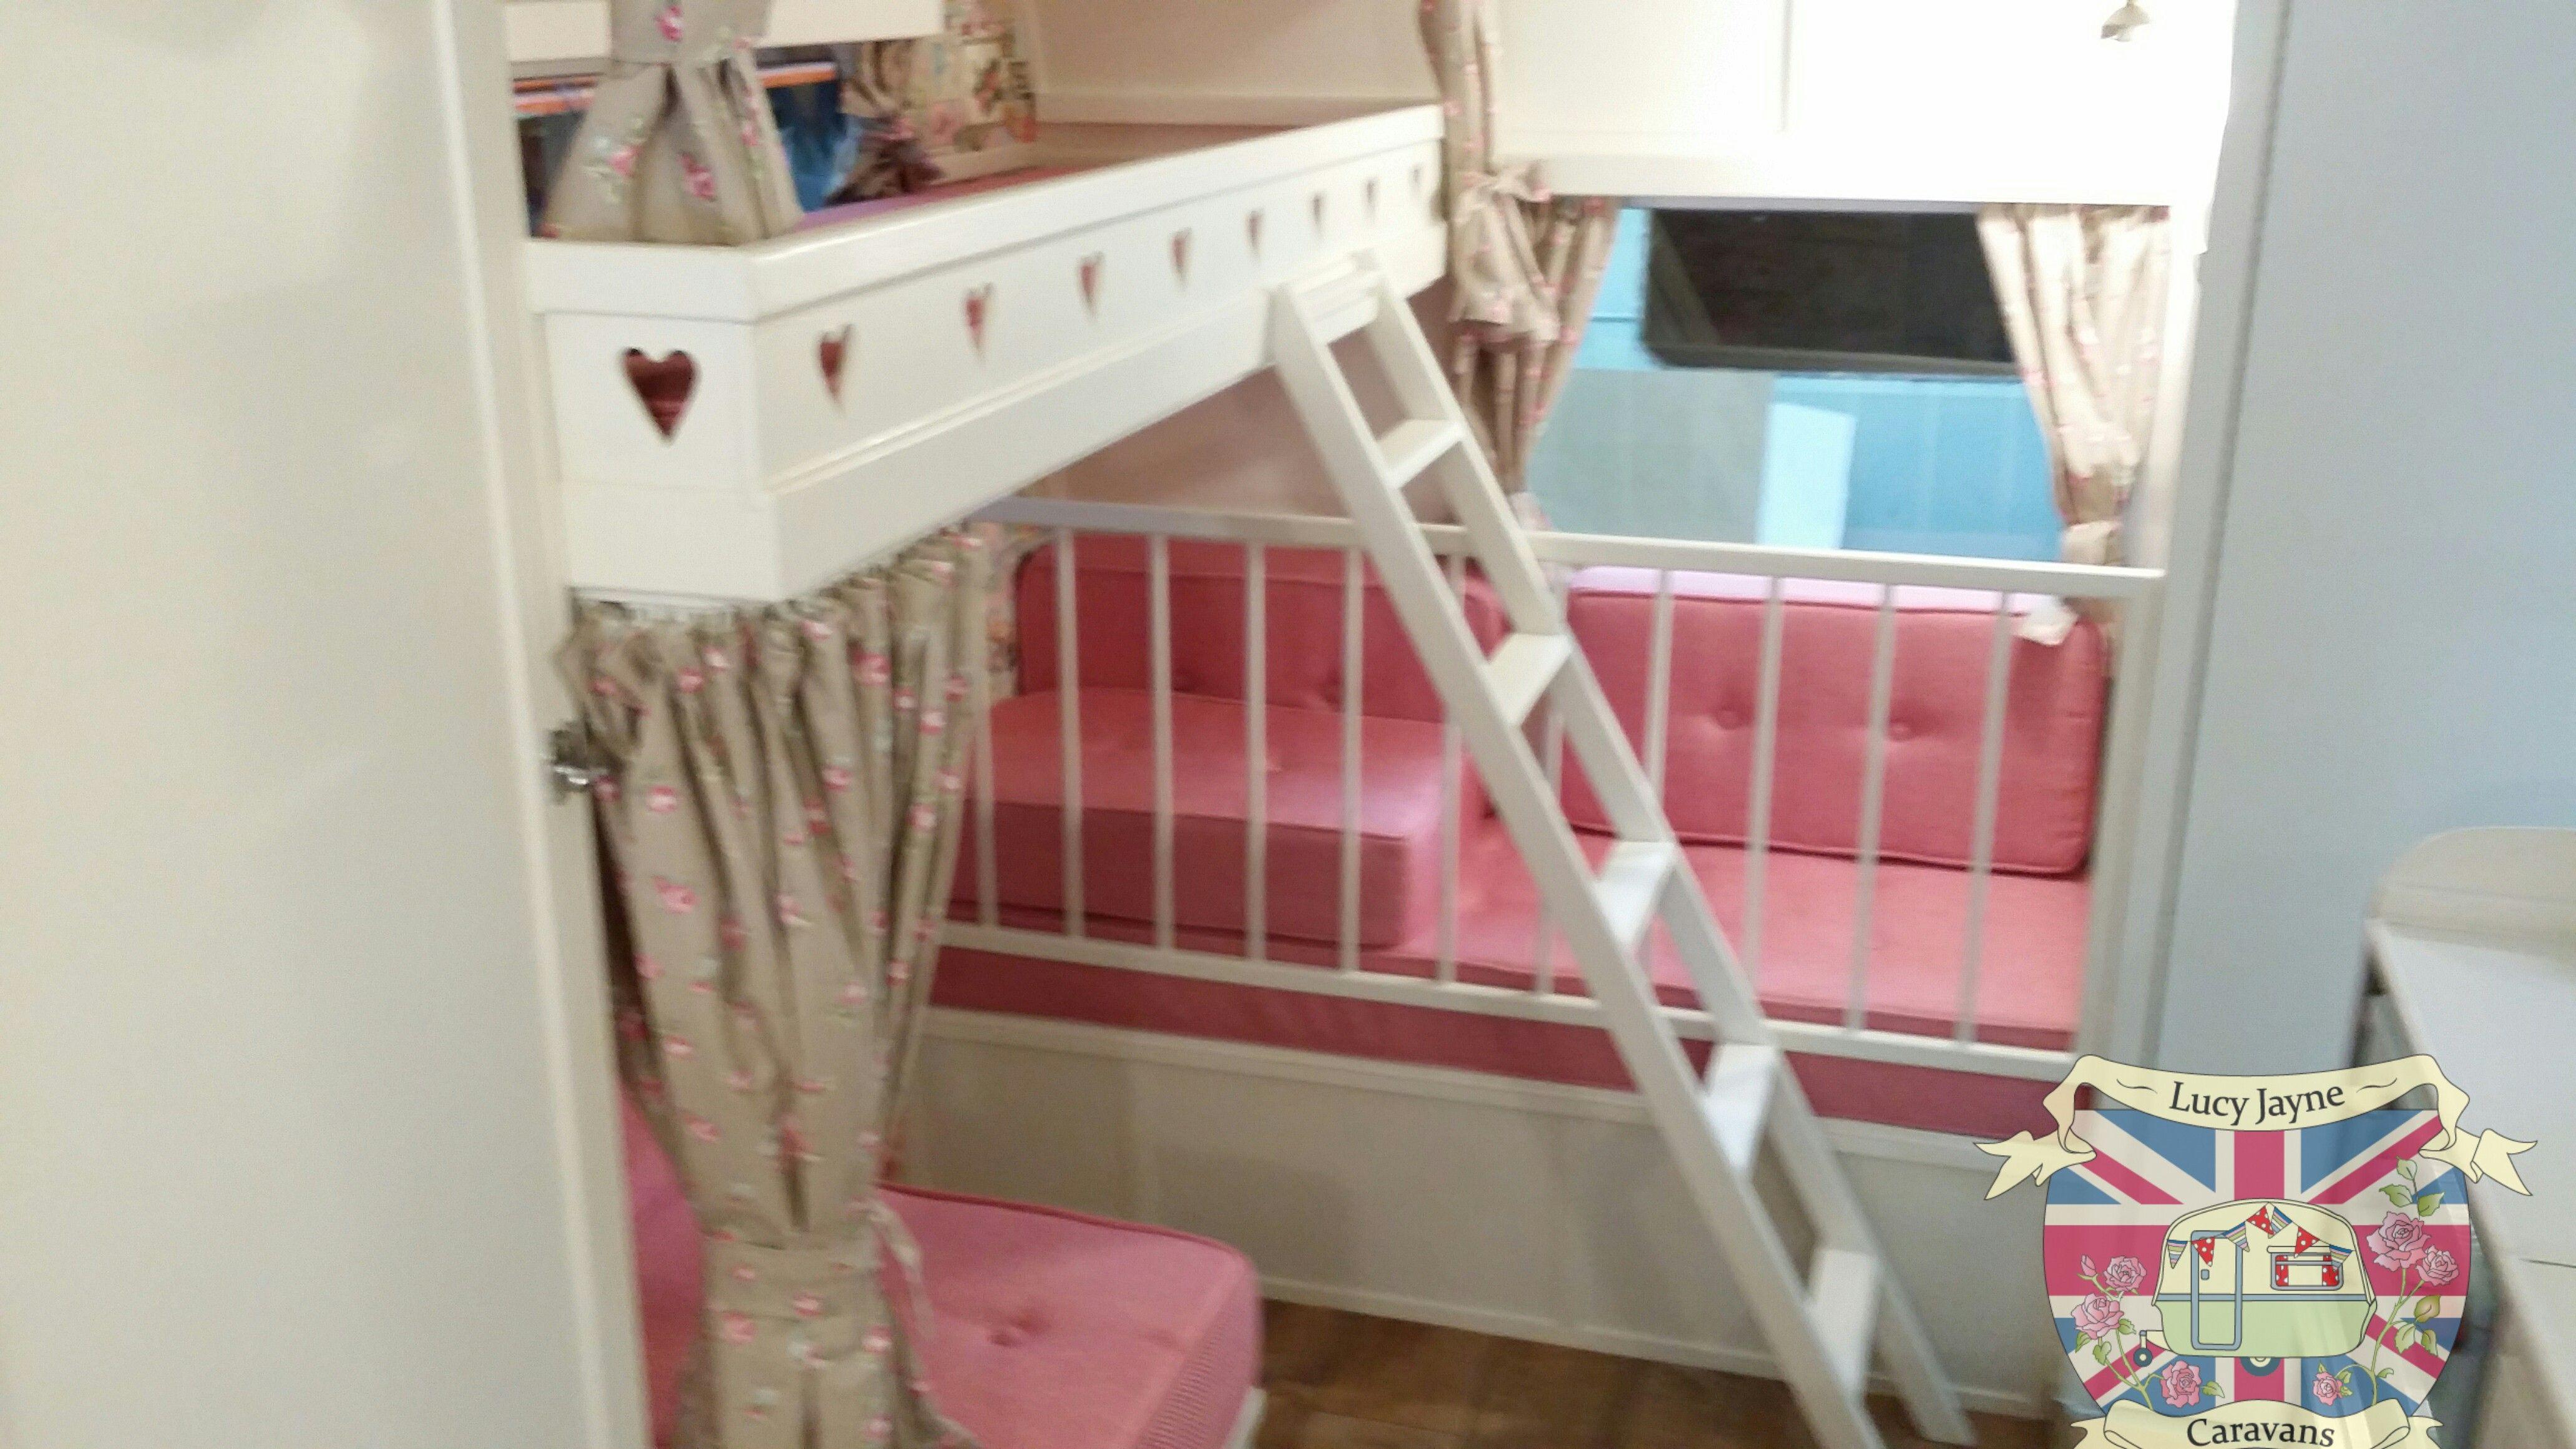 Vintage Caravan Bespoke Built Bunk Beds And Cot